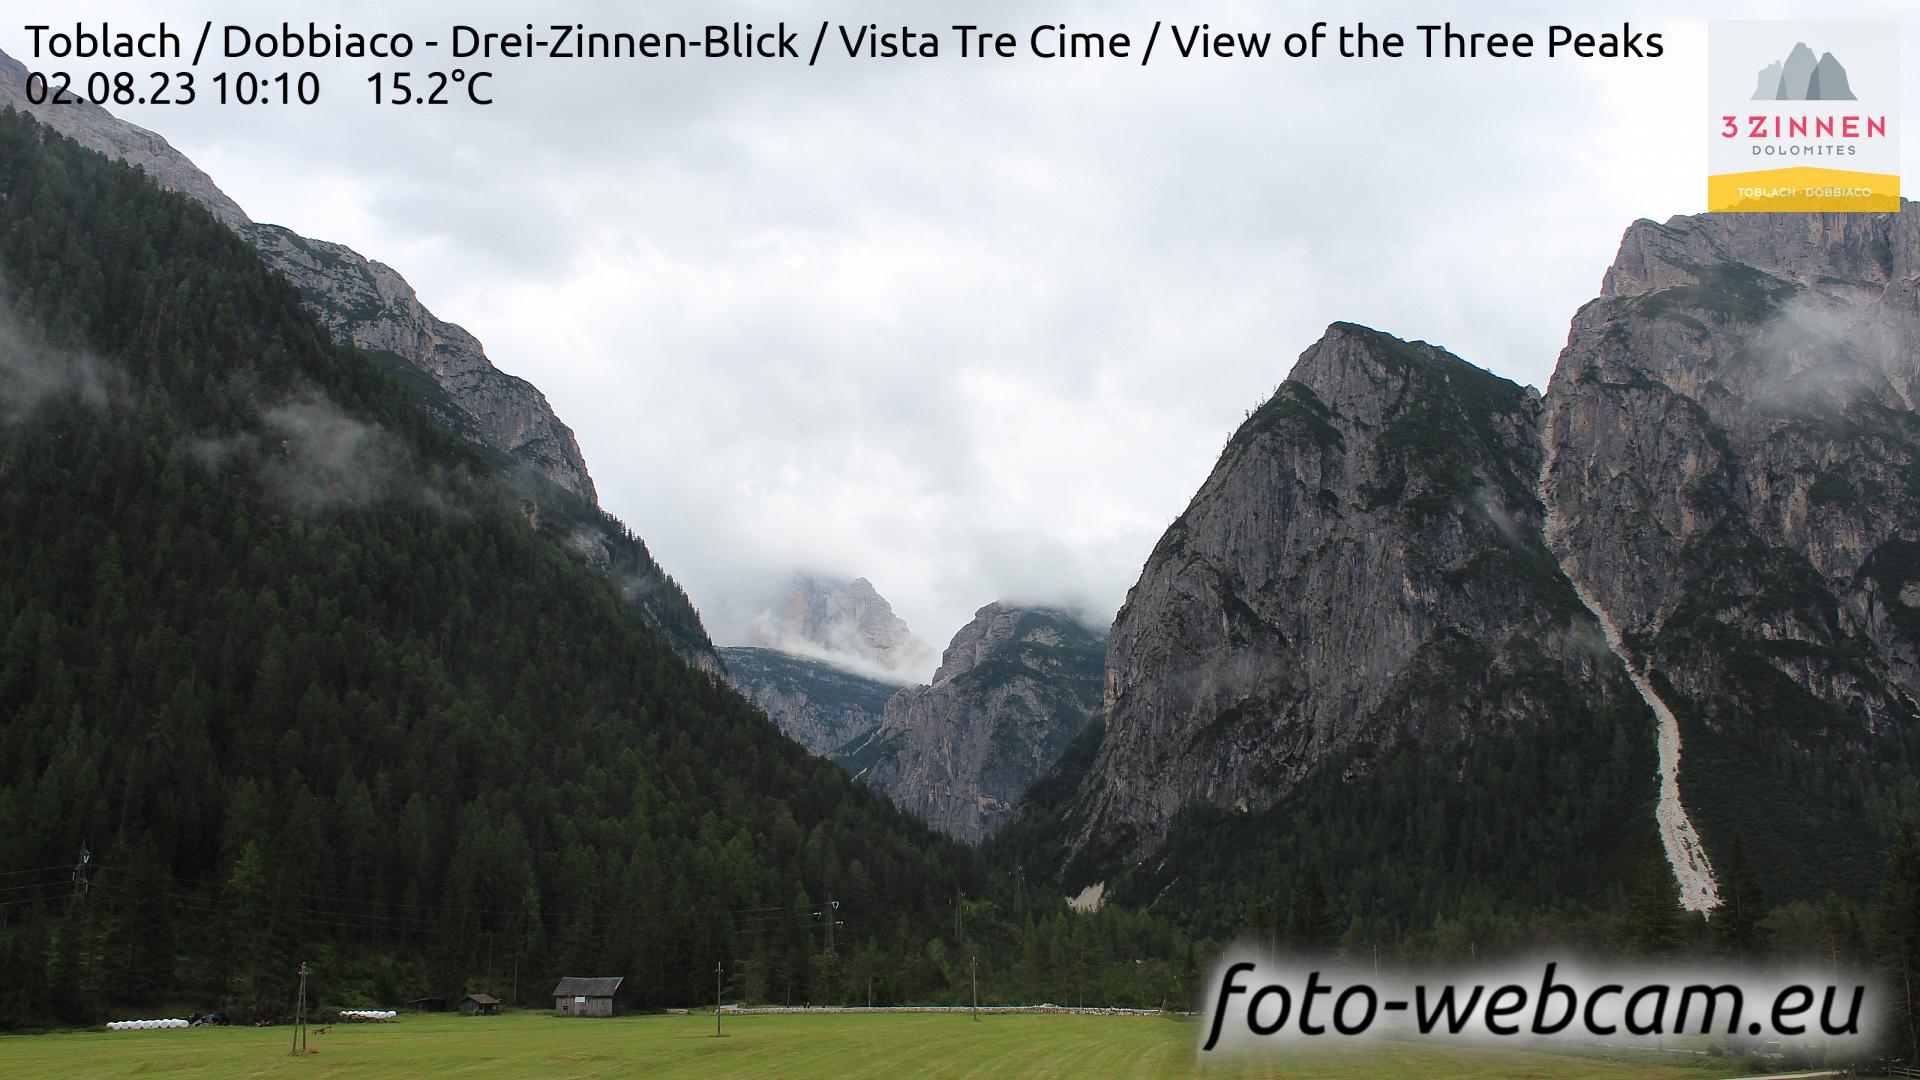 Toblach (Dolomites) Tue. 10:27